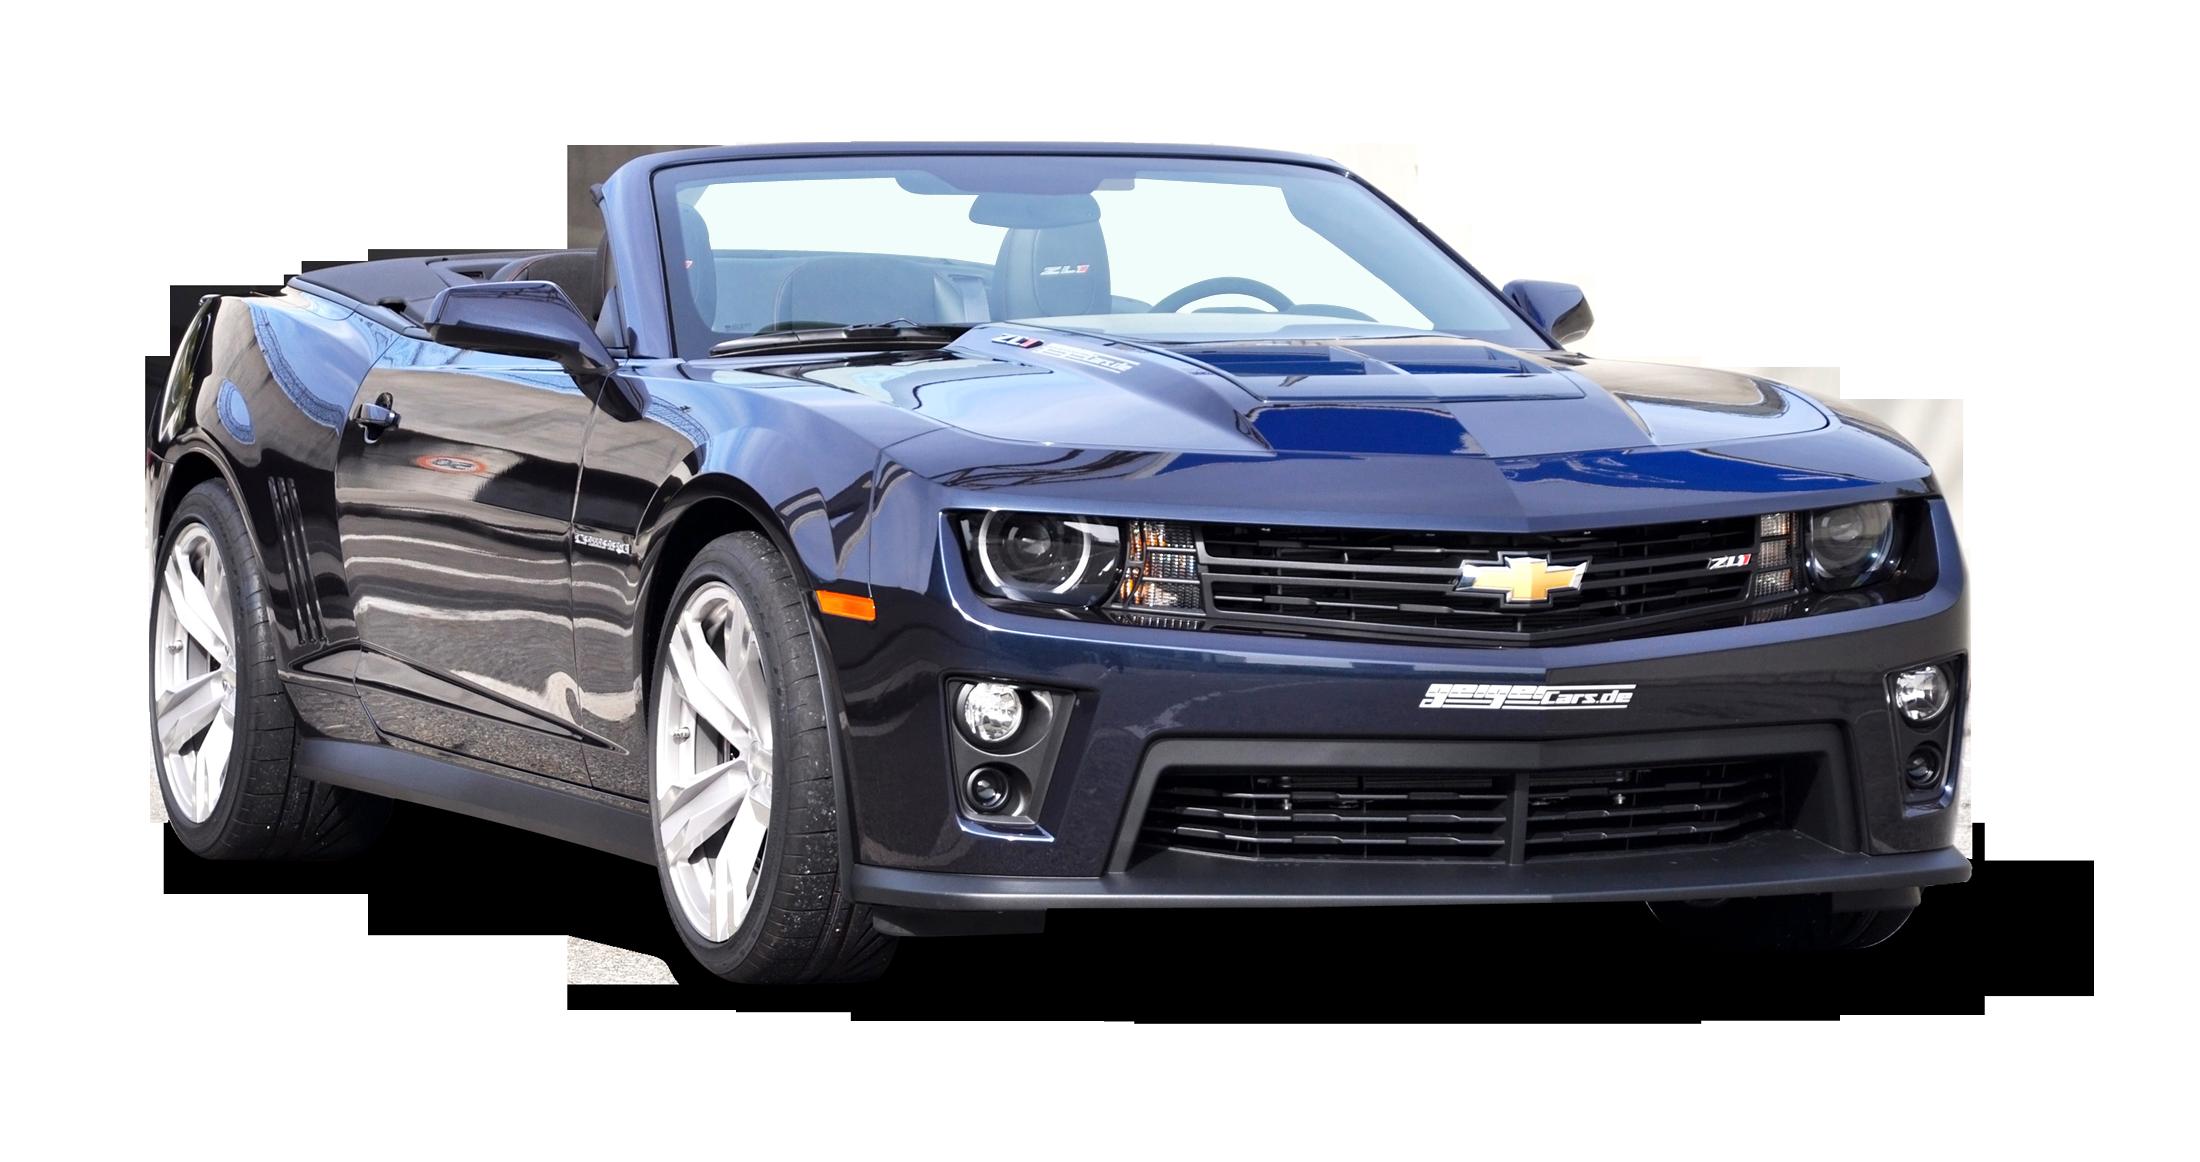 Chevrolet Camaro PNG Image